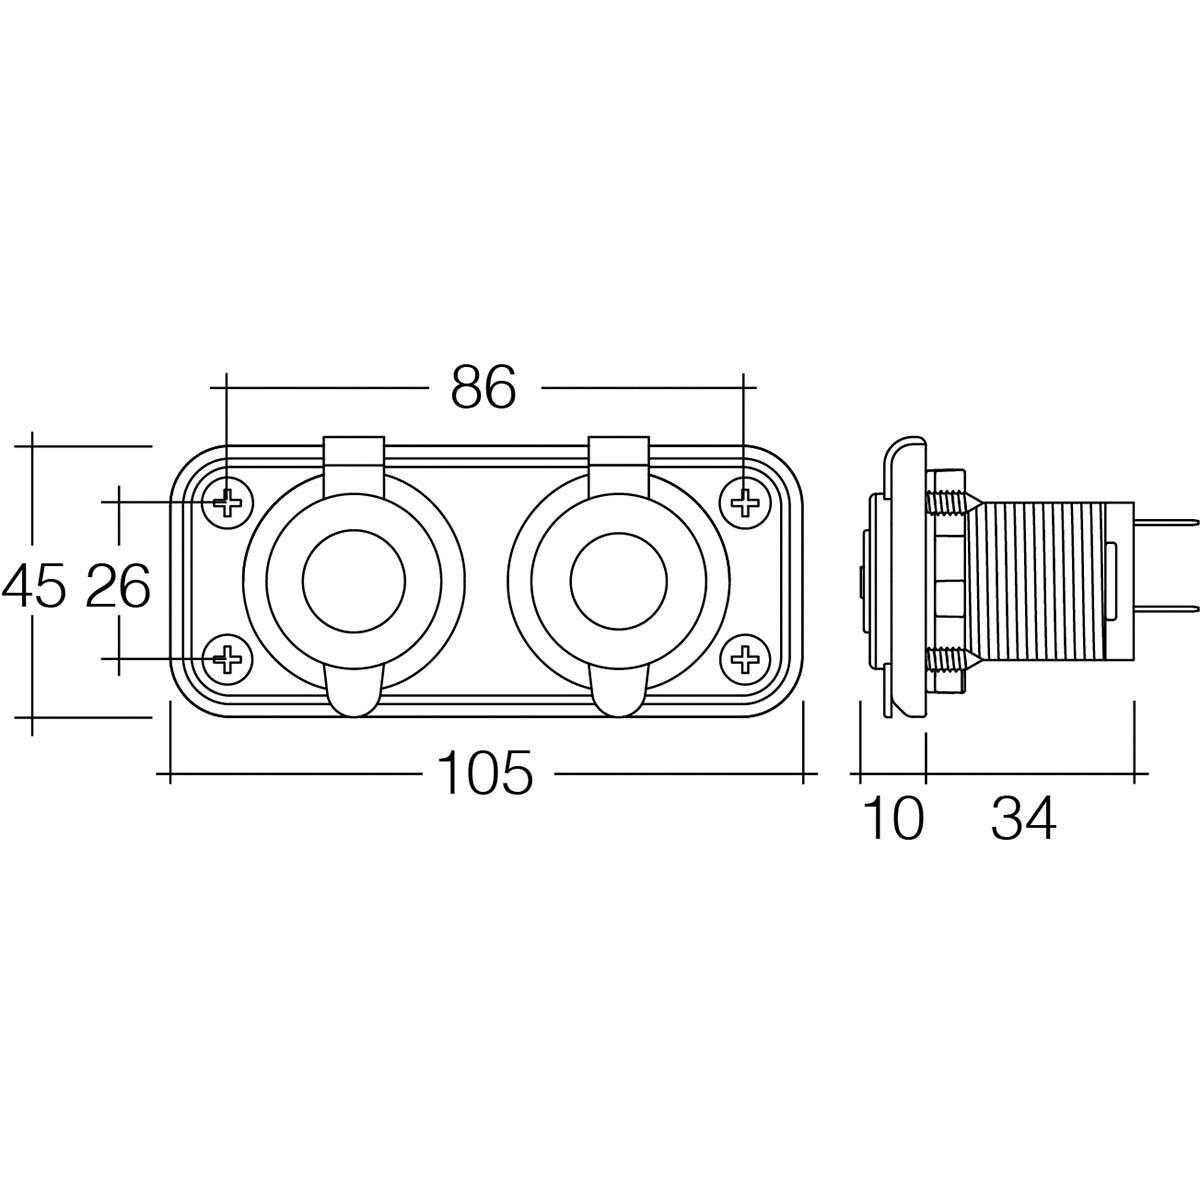 hight resolution of 12 24v twin accessory usb socket heavy duty acc dual usb